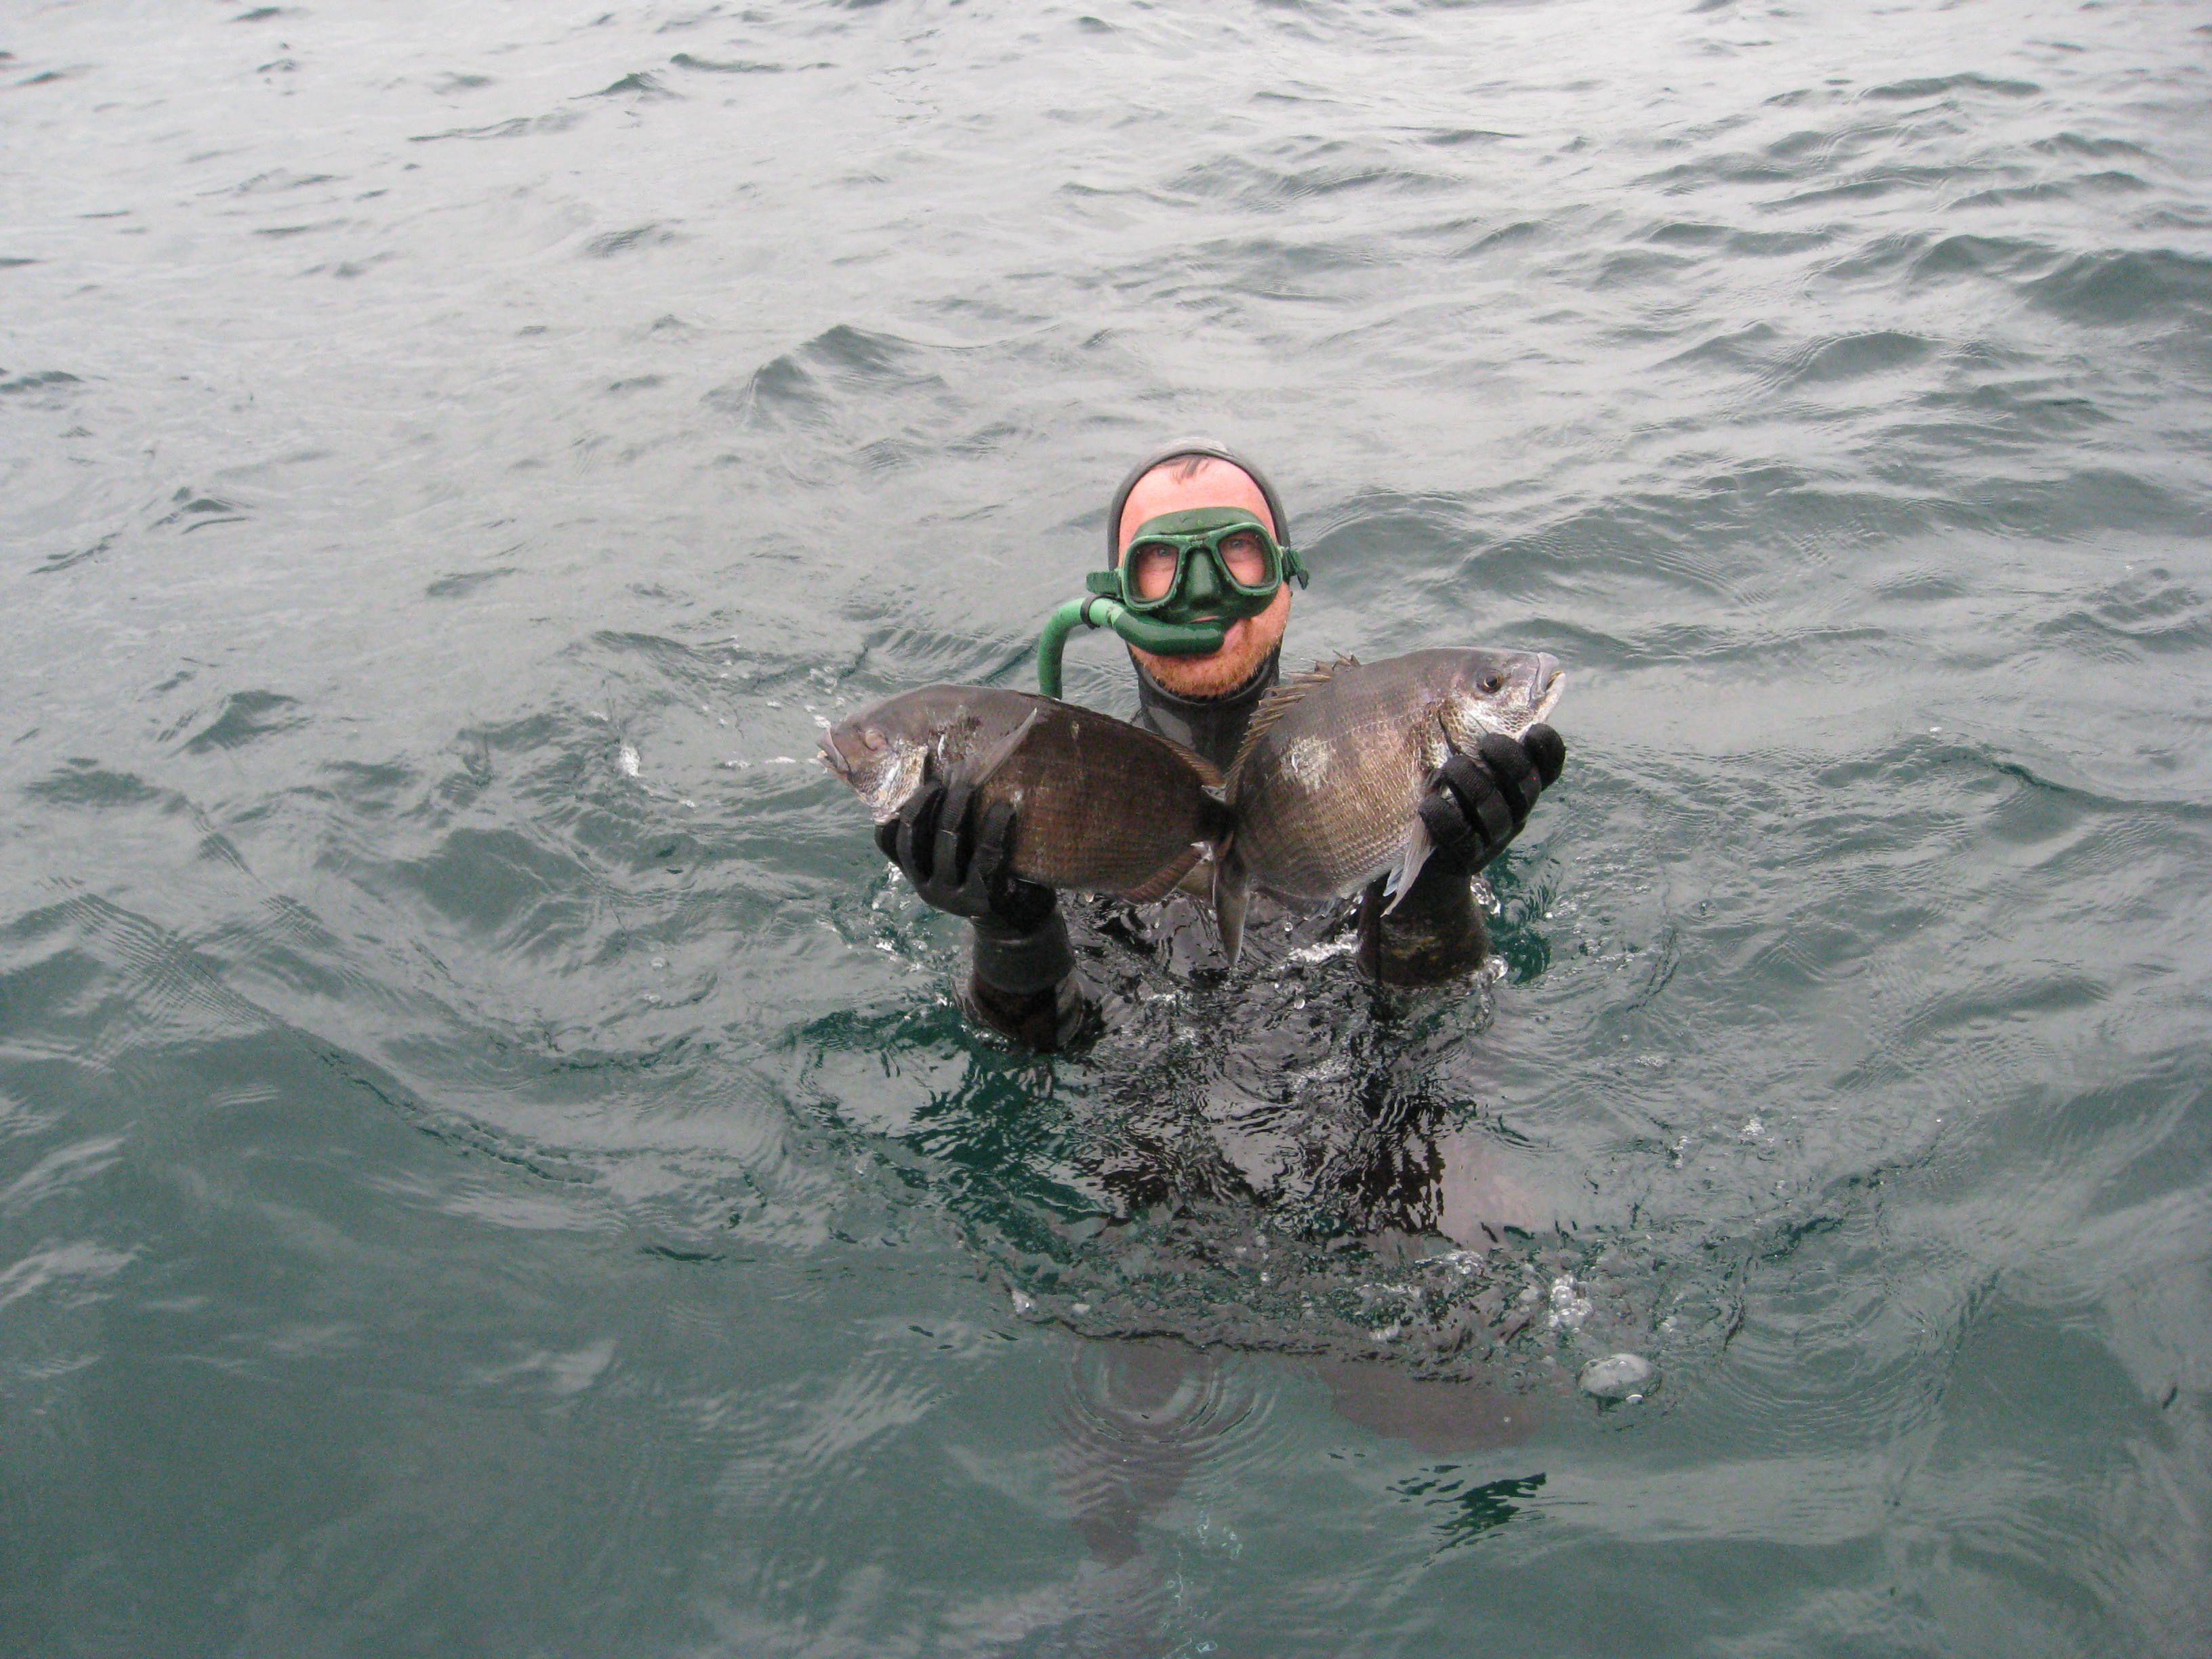 Diversas actividades acuáticas